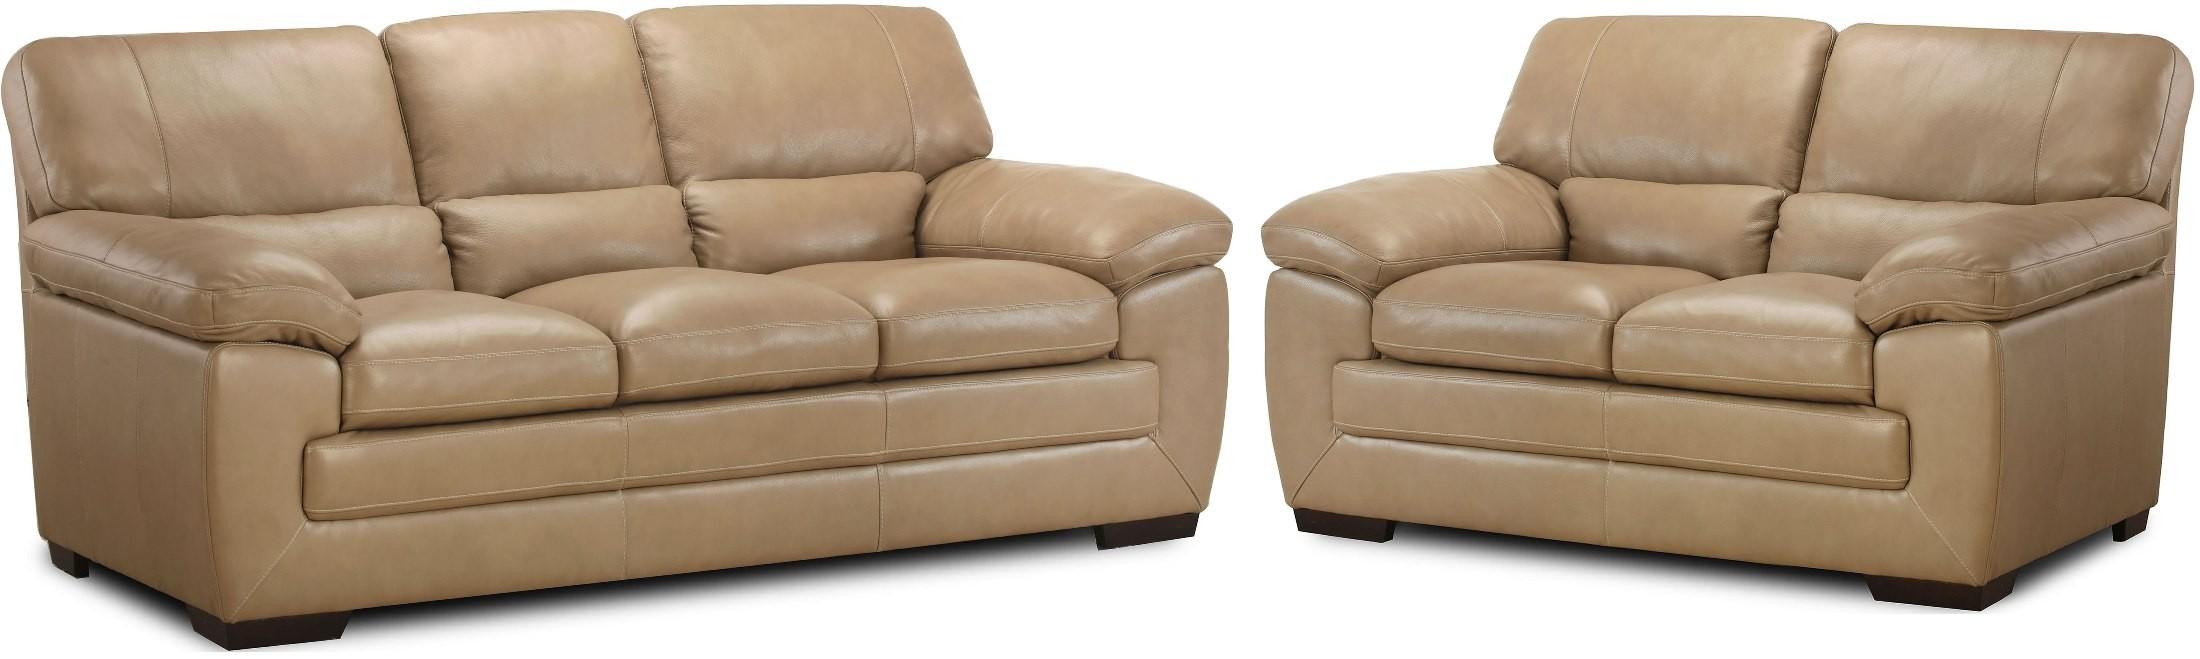 biscayne longhorn wheat leather living room set - Simon Li Furniture